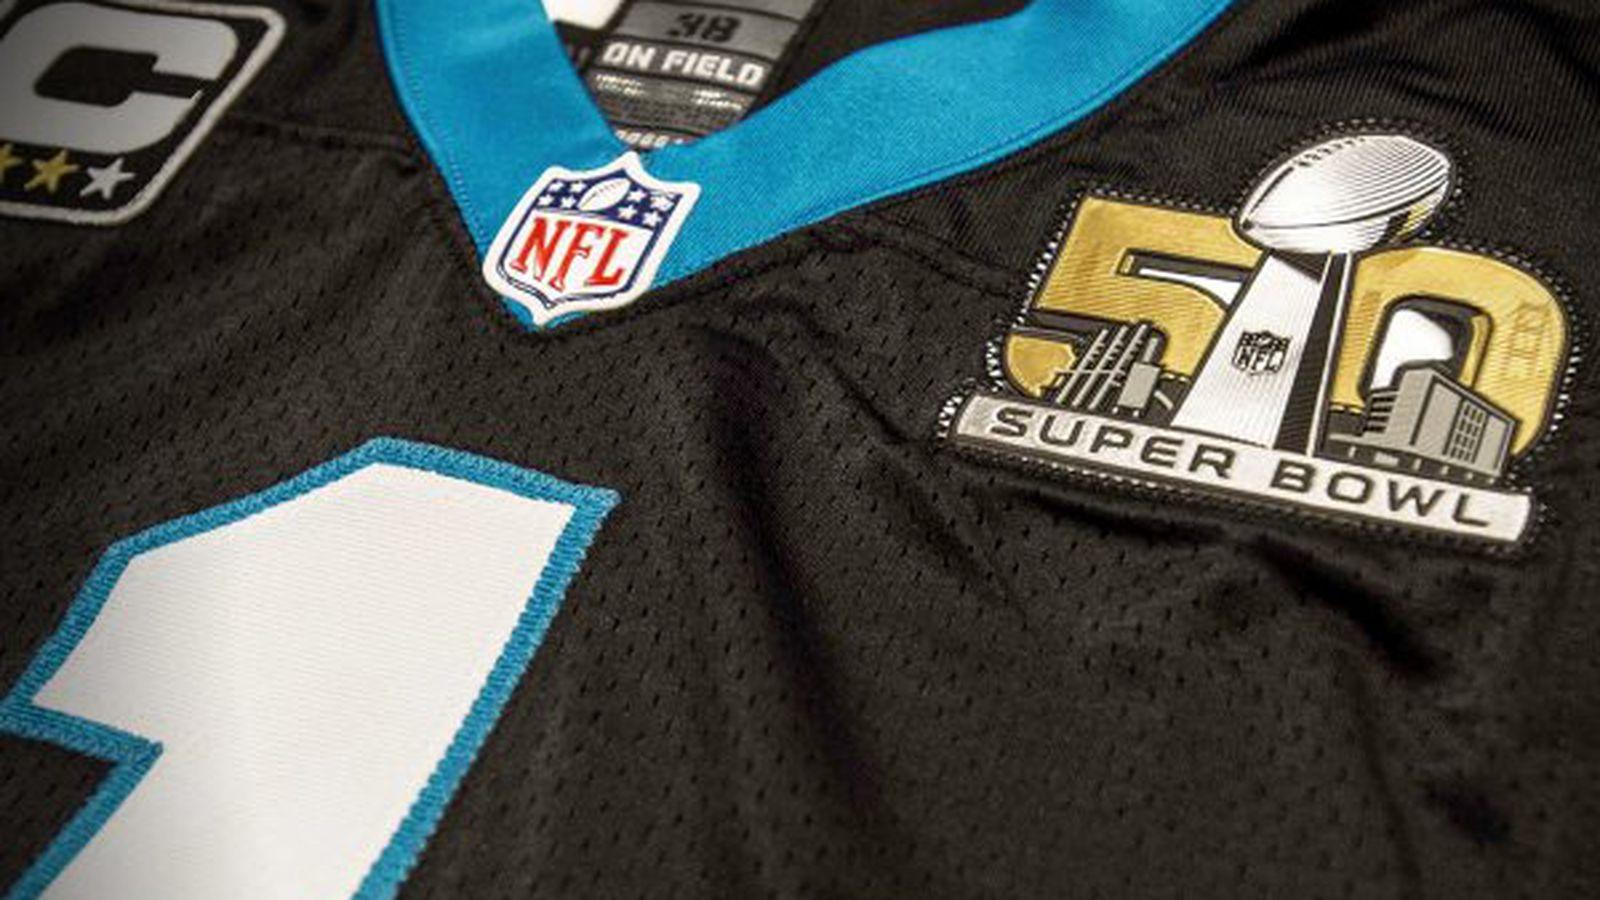 Cheap NFL Jerseys Online - Panthers unveil Super Bowl 50 jersey with patch - Cat Scratch Reader